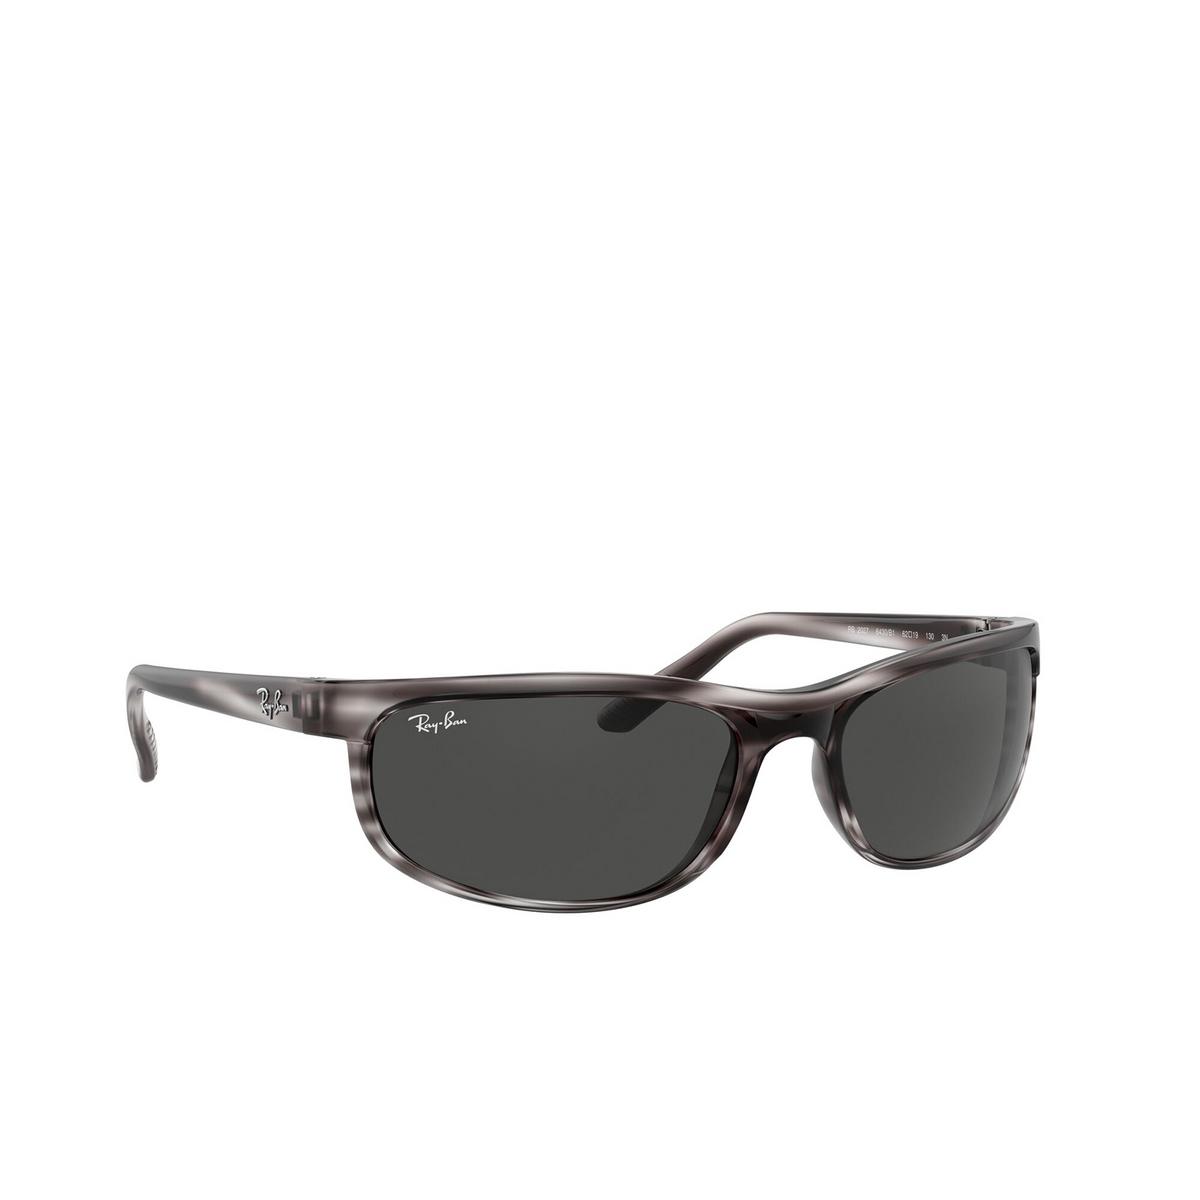 Ray-Ban® Rectangle Sunglasses: Predator 2 RB2027 color Striped Grey Havana 6430B1 - three-quarters view.